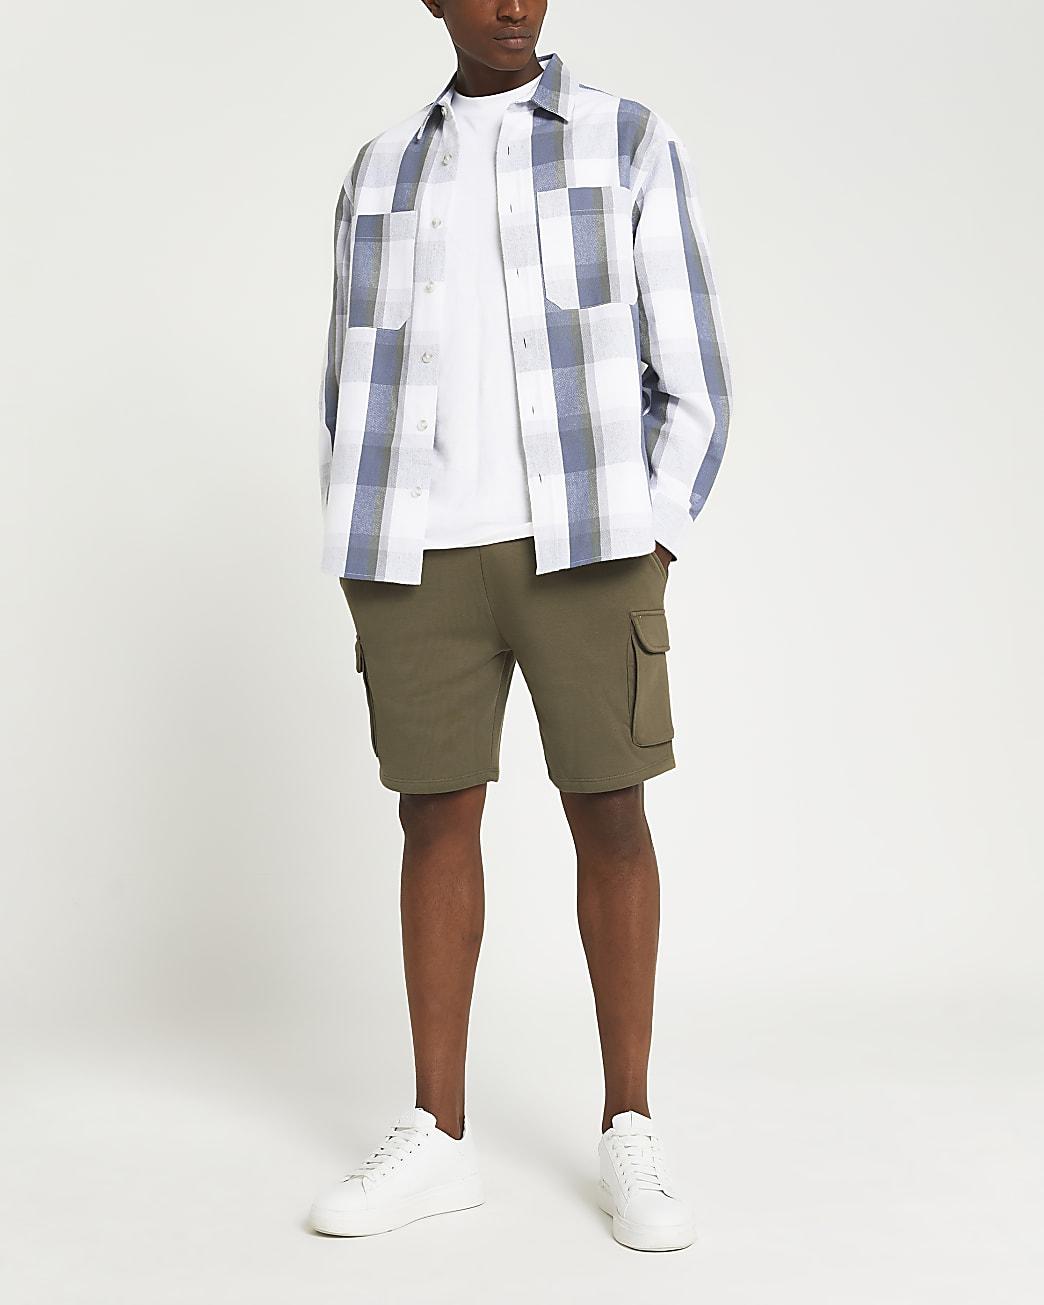 Khaki slim fit cargo shorts